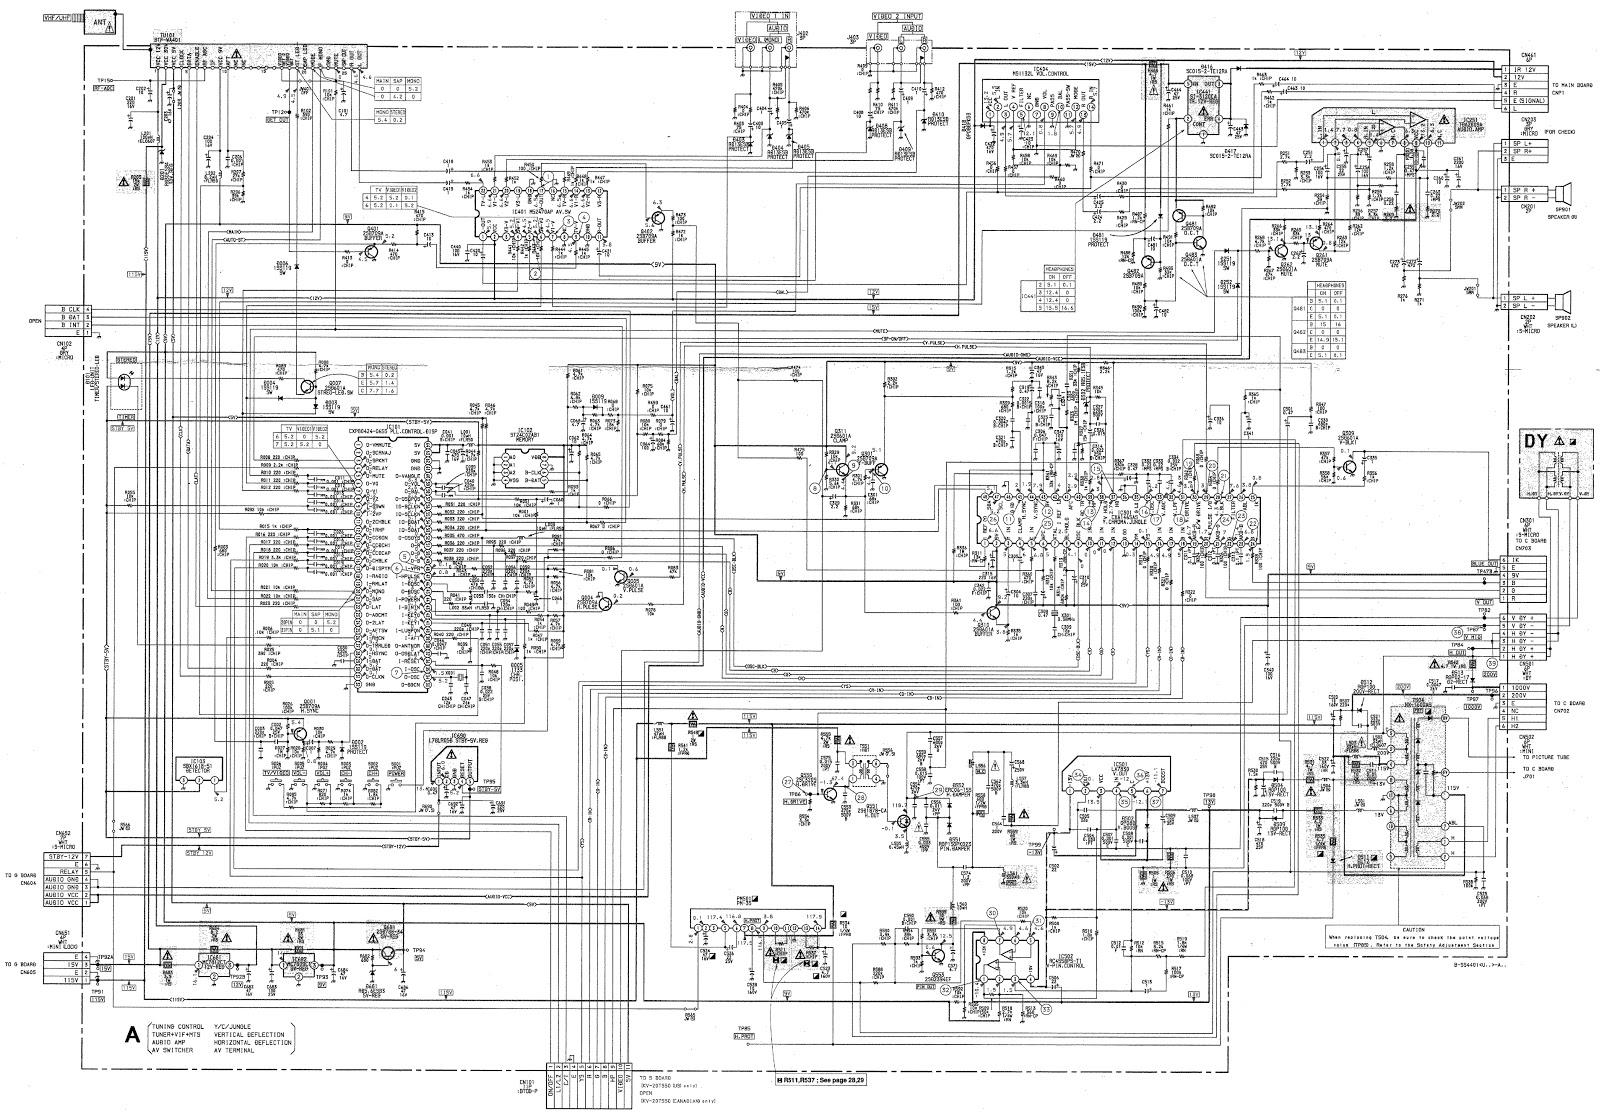 sony tv circuit diagram moreover tv schematic circuit diagram also sony tv circuit diagram moreover tv [ 1600 x 1114 Pixel ]